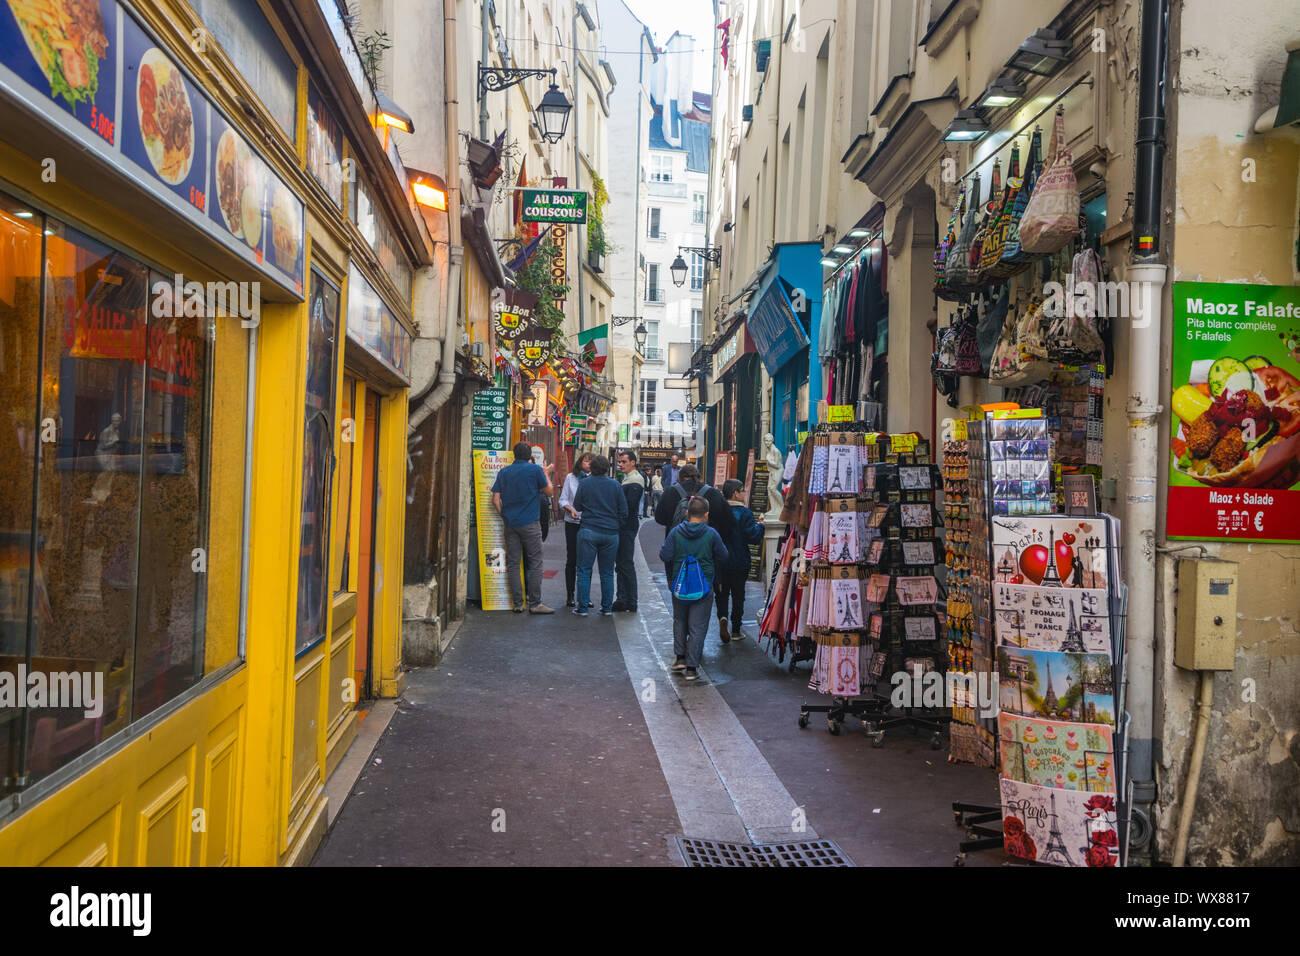 PARIS, FRANCE - 02 OCTOBER 2018: People walking on the narrow street in latin quarter in Paris. Stock Photo